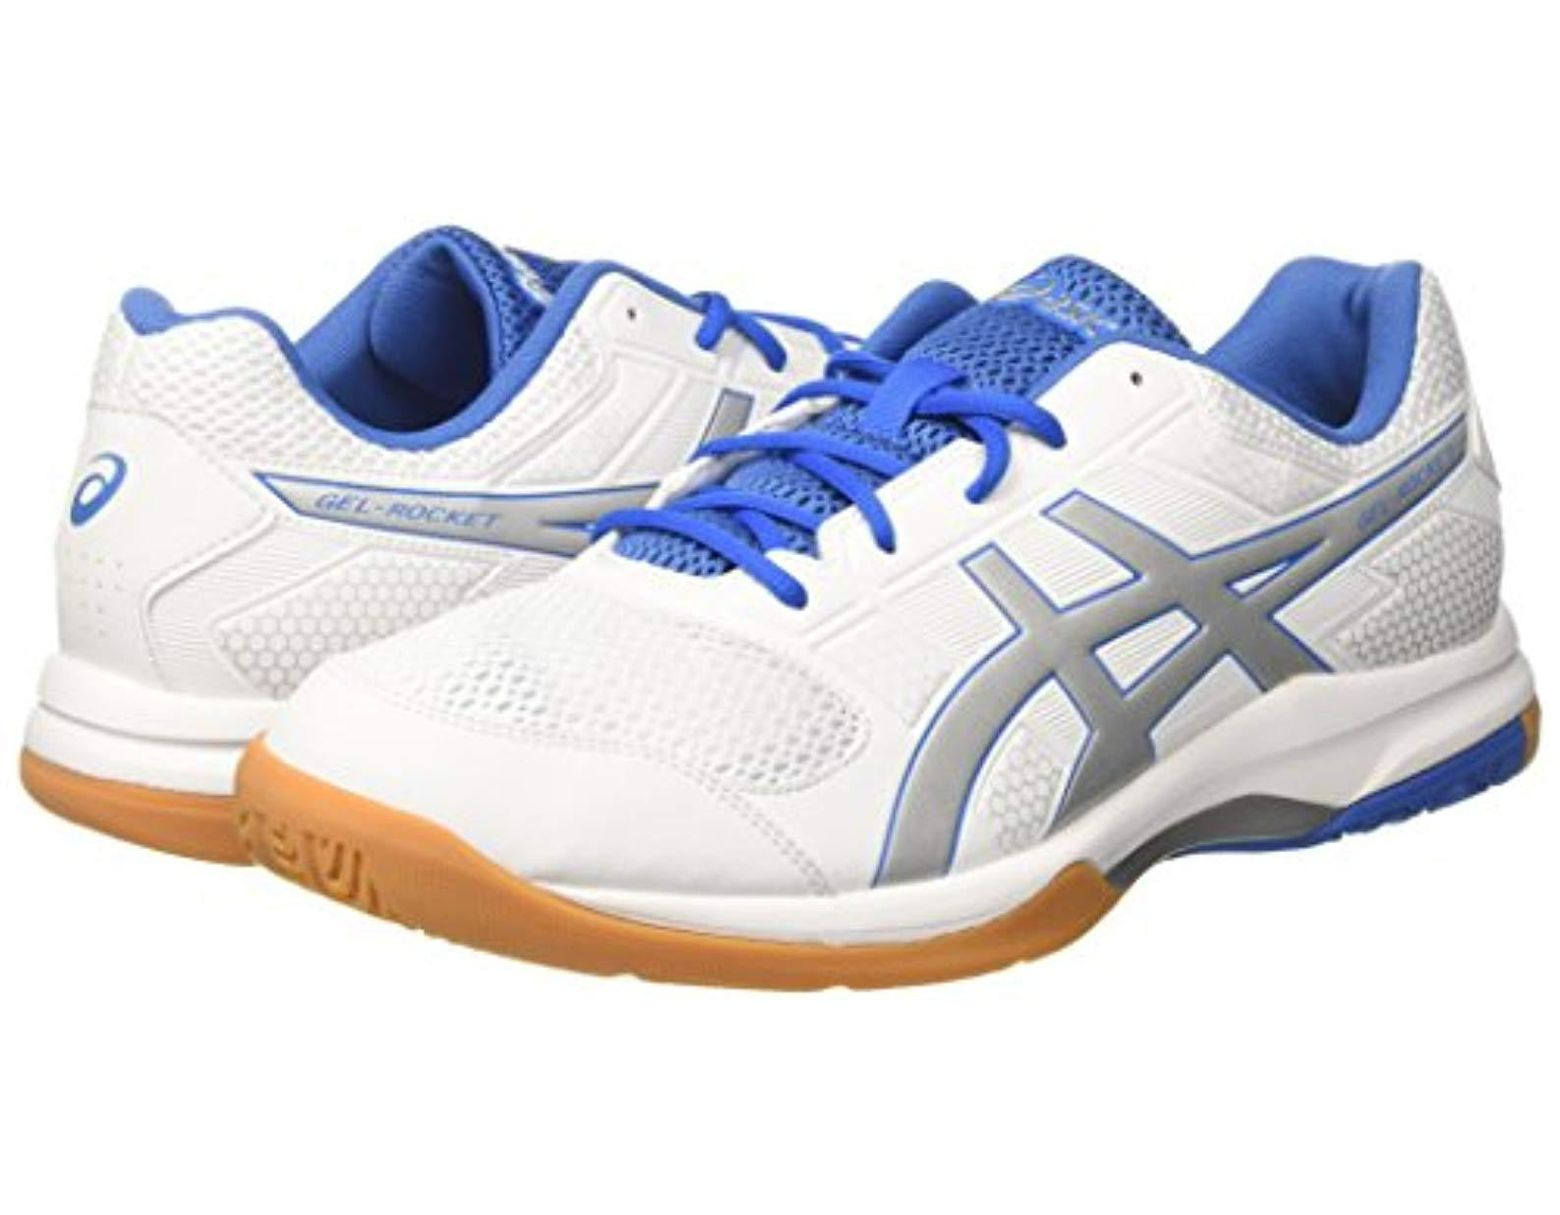 062397b713 Asics Gel-rocket 8 Multisport Indoor Shoes in White for Men - Save 26% -  Lyst